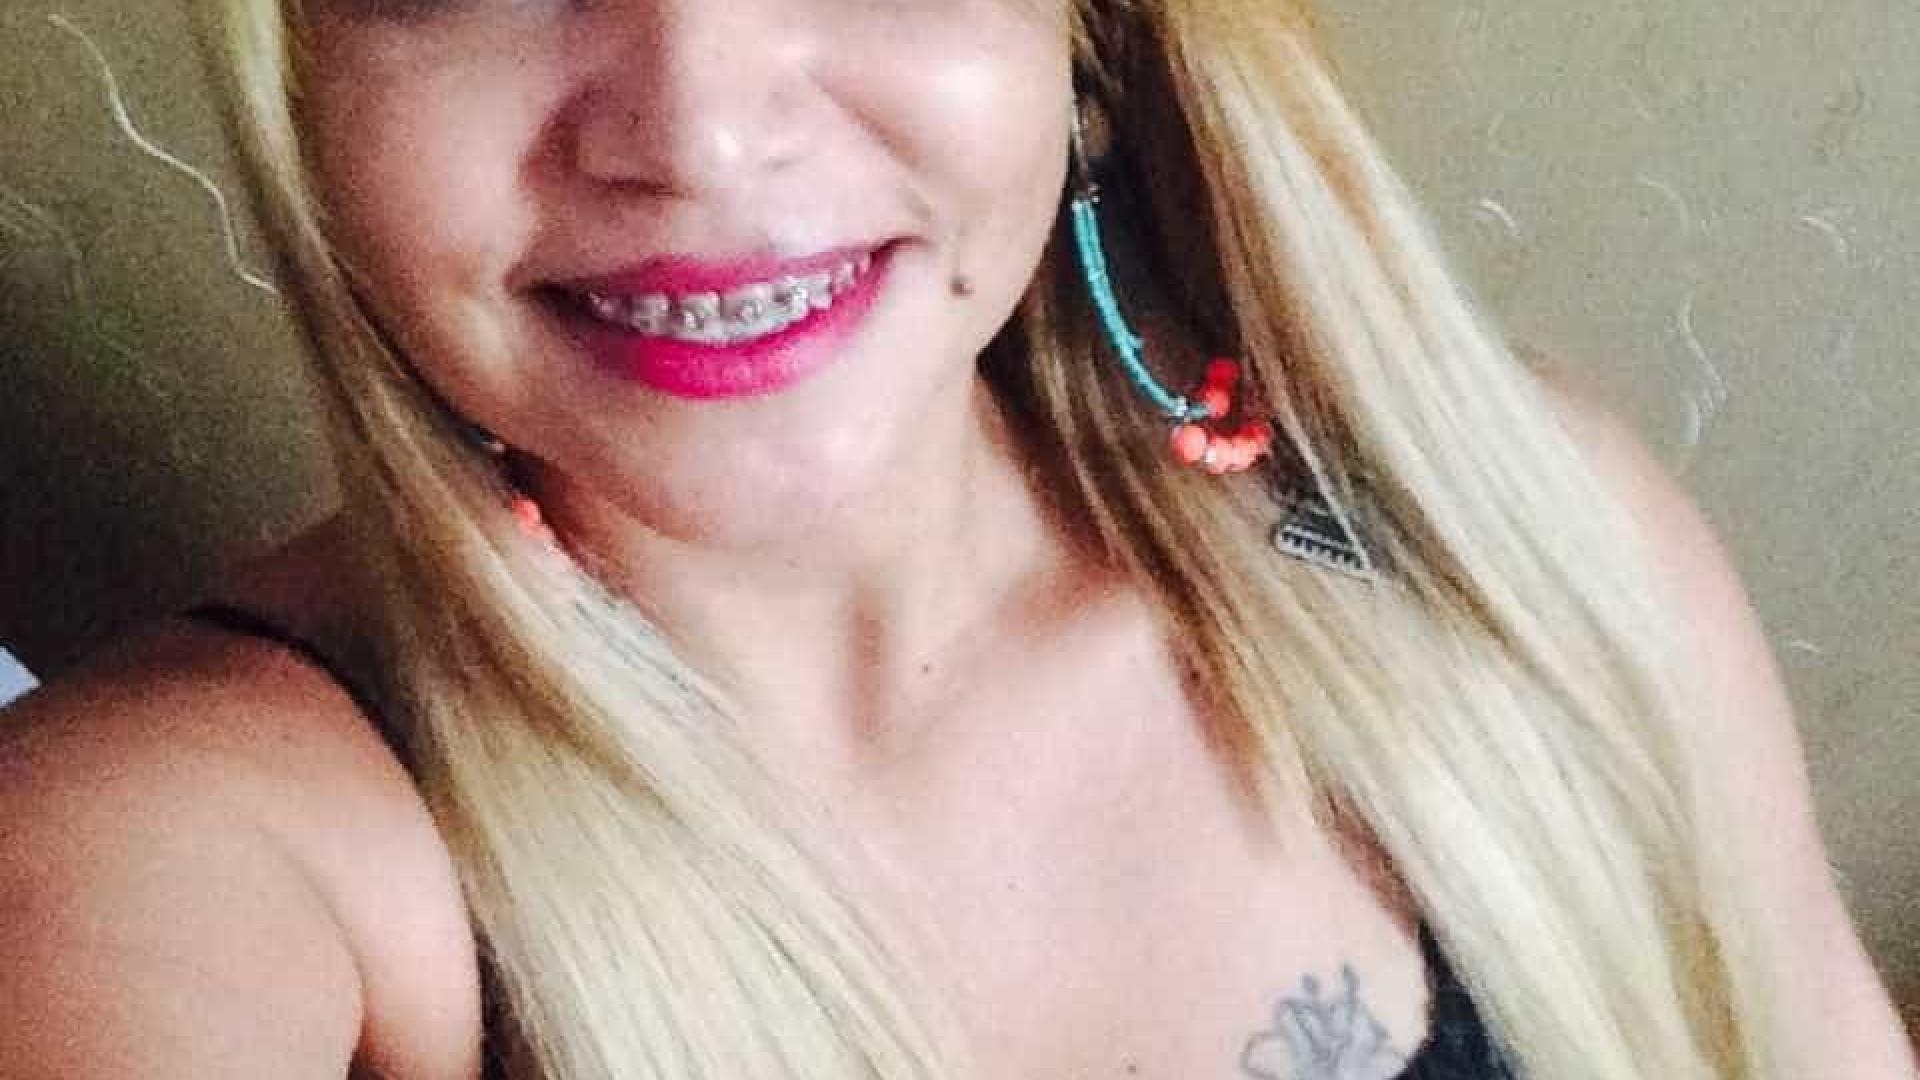 Mulher morre ao cair de sacada de pousada após usar cocaína